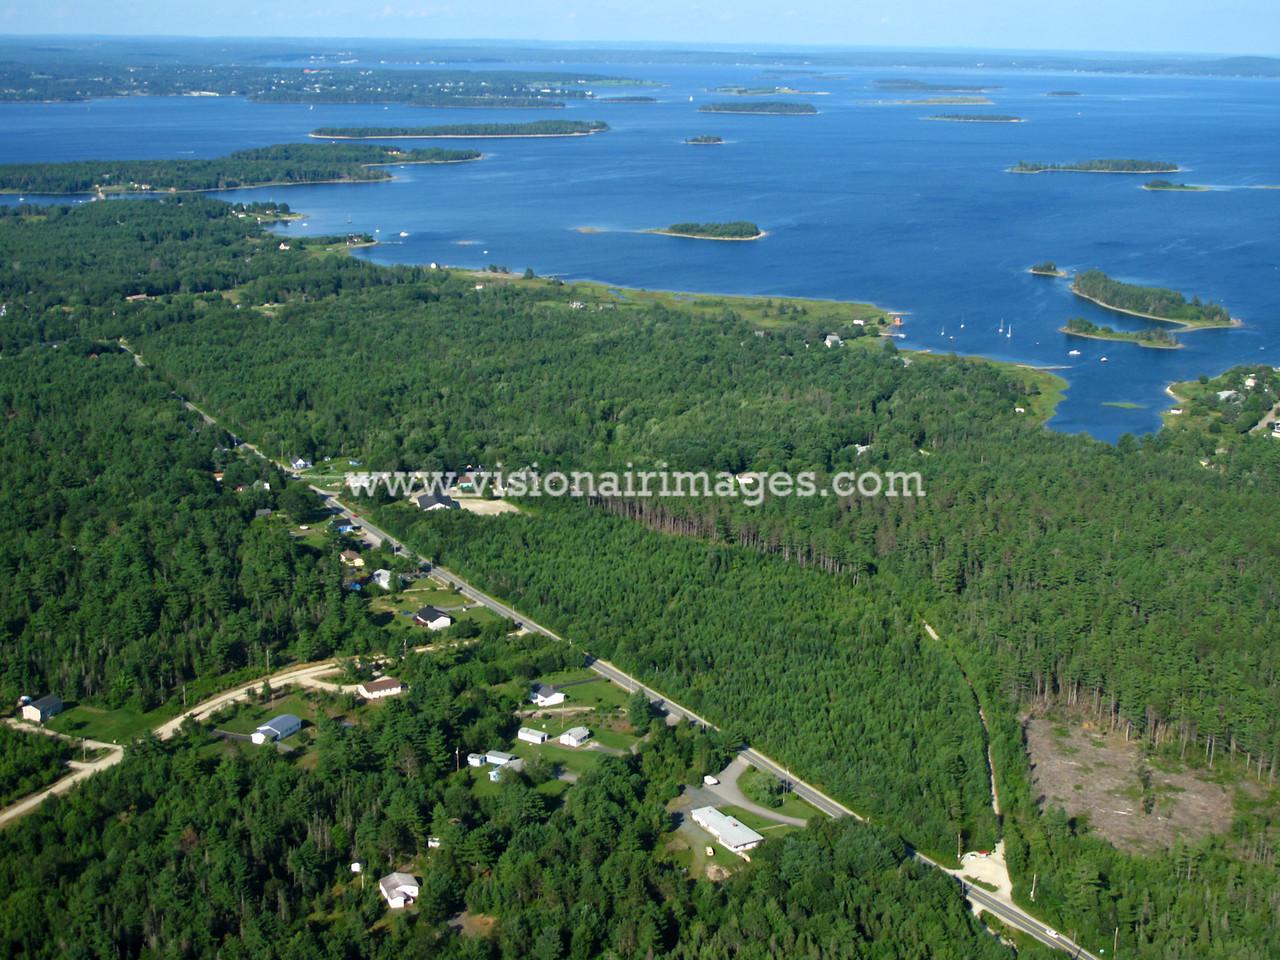 Western Shore, Mahone Bay, Oak Island, Nova Scotia Canada